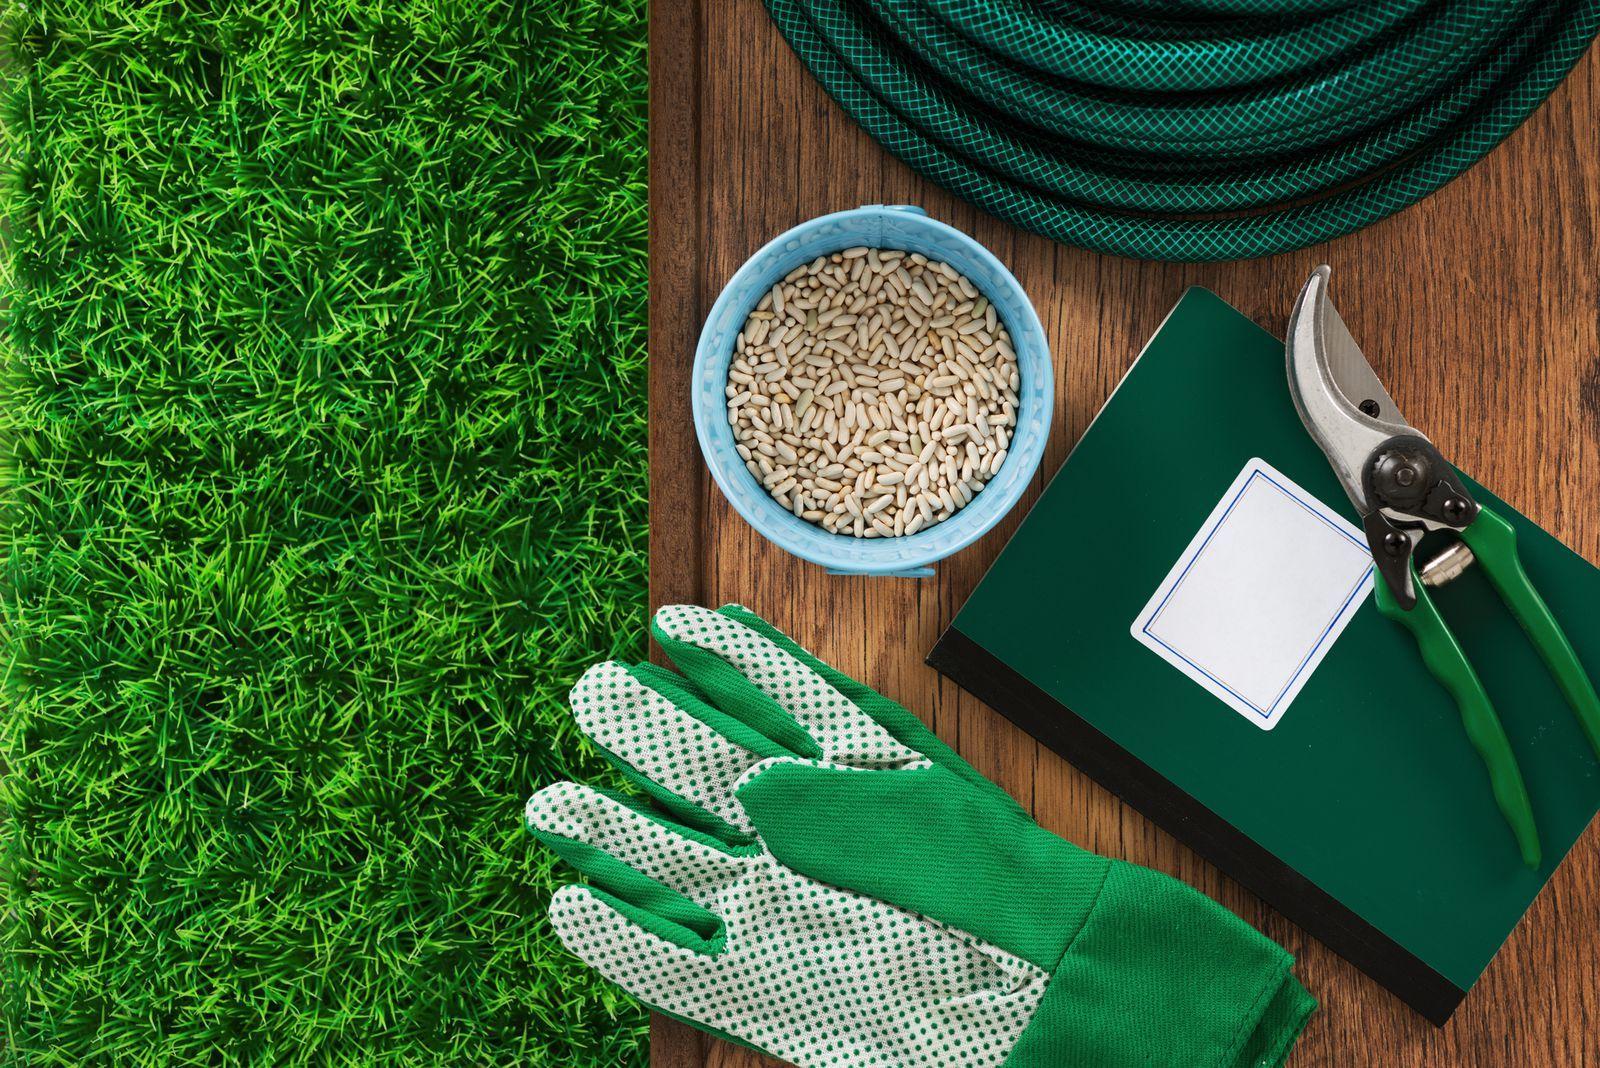 Pin On Backyard Gardening